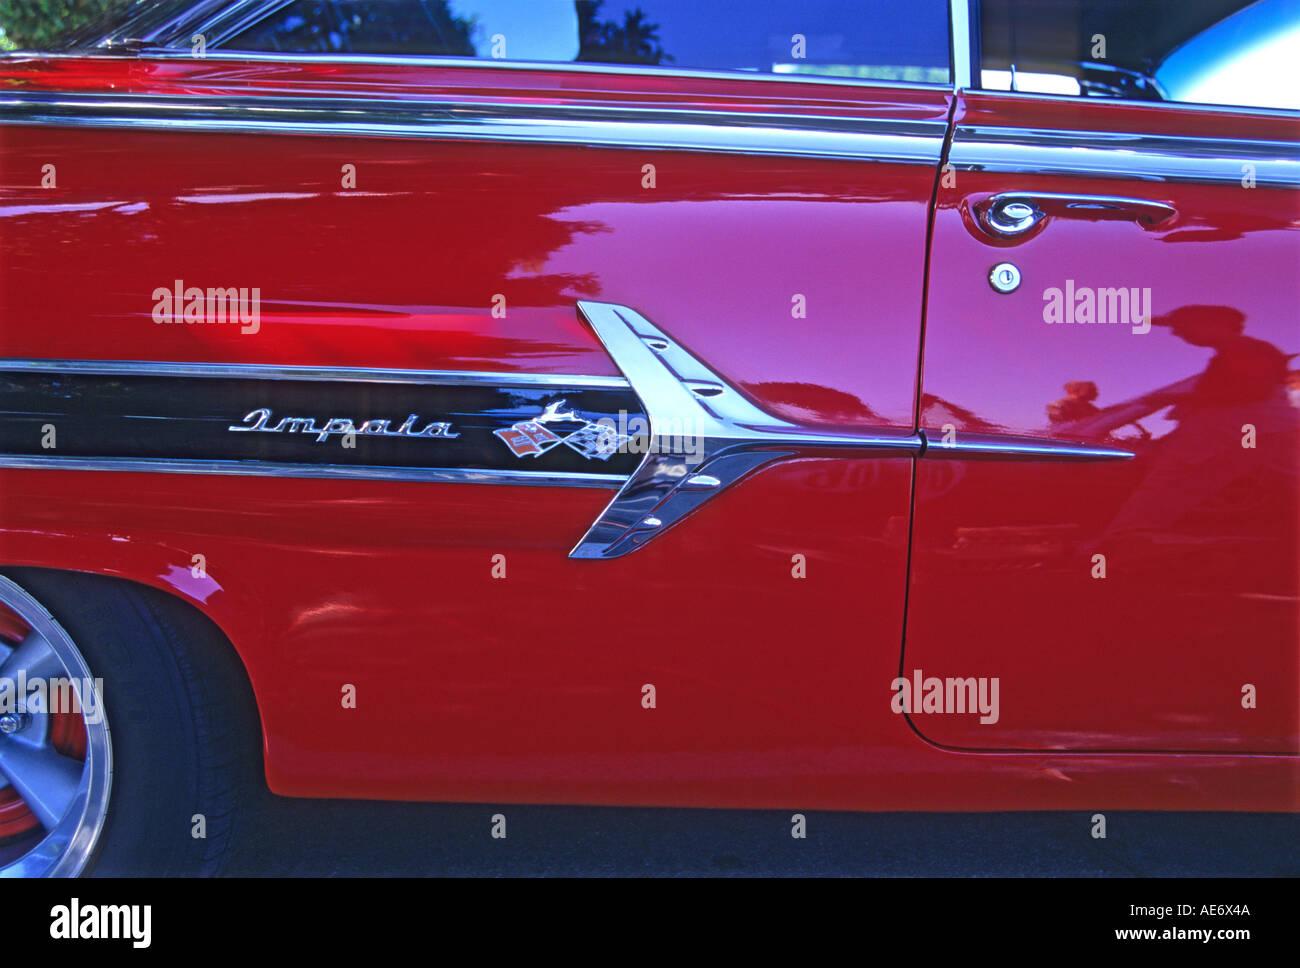 '^1960 Chevrolet Impala 2 door Coupe, ^badge, California' - Stock Image